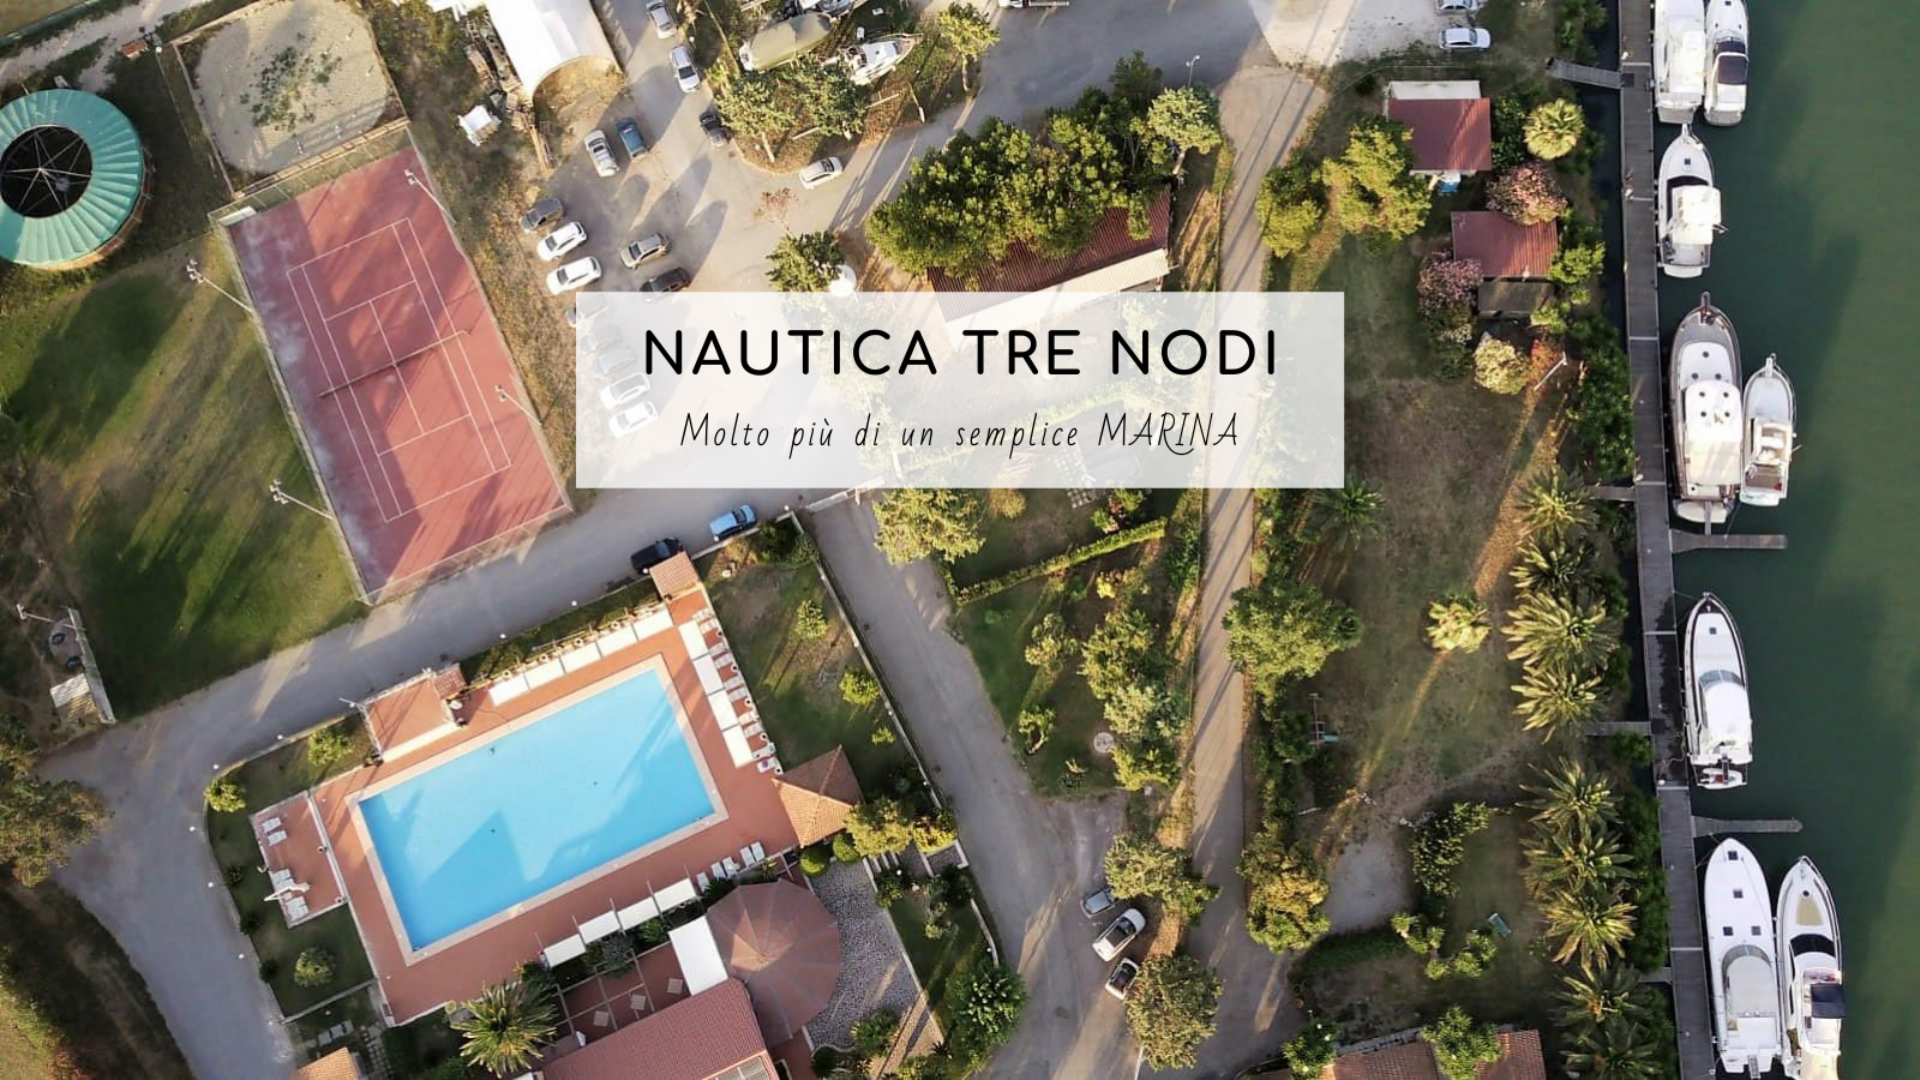 Nautica Tre Nodi